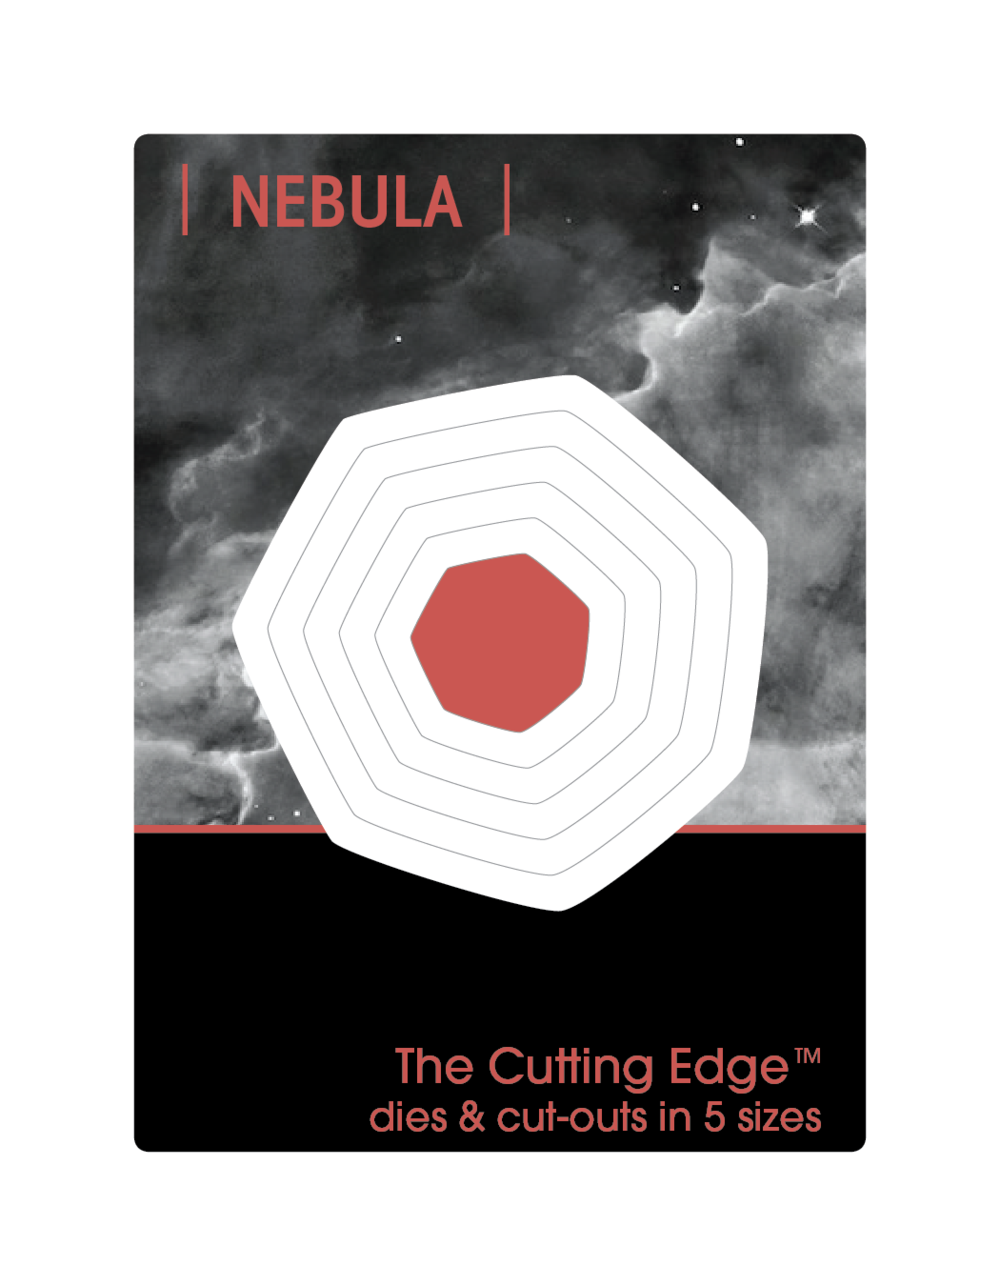 NEBULA.cover.jpg